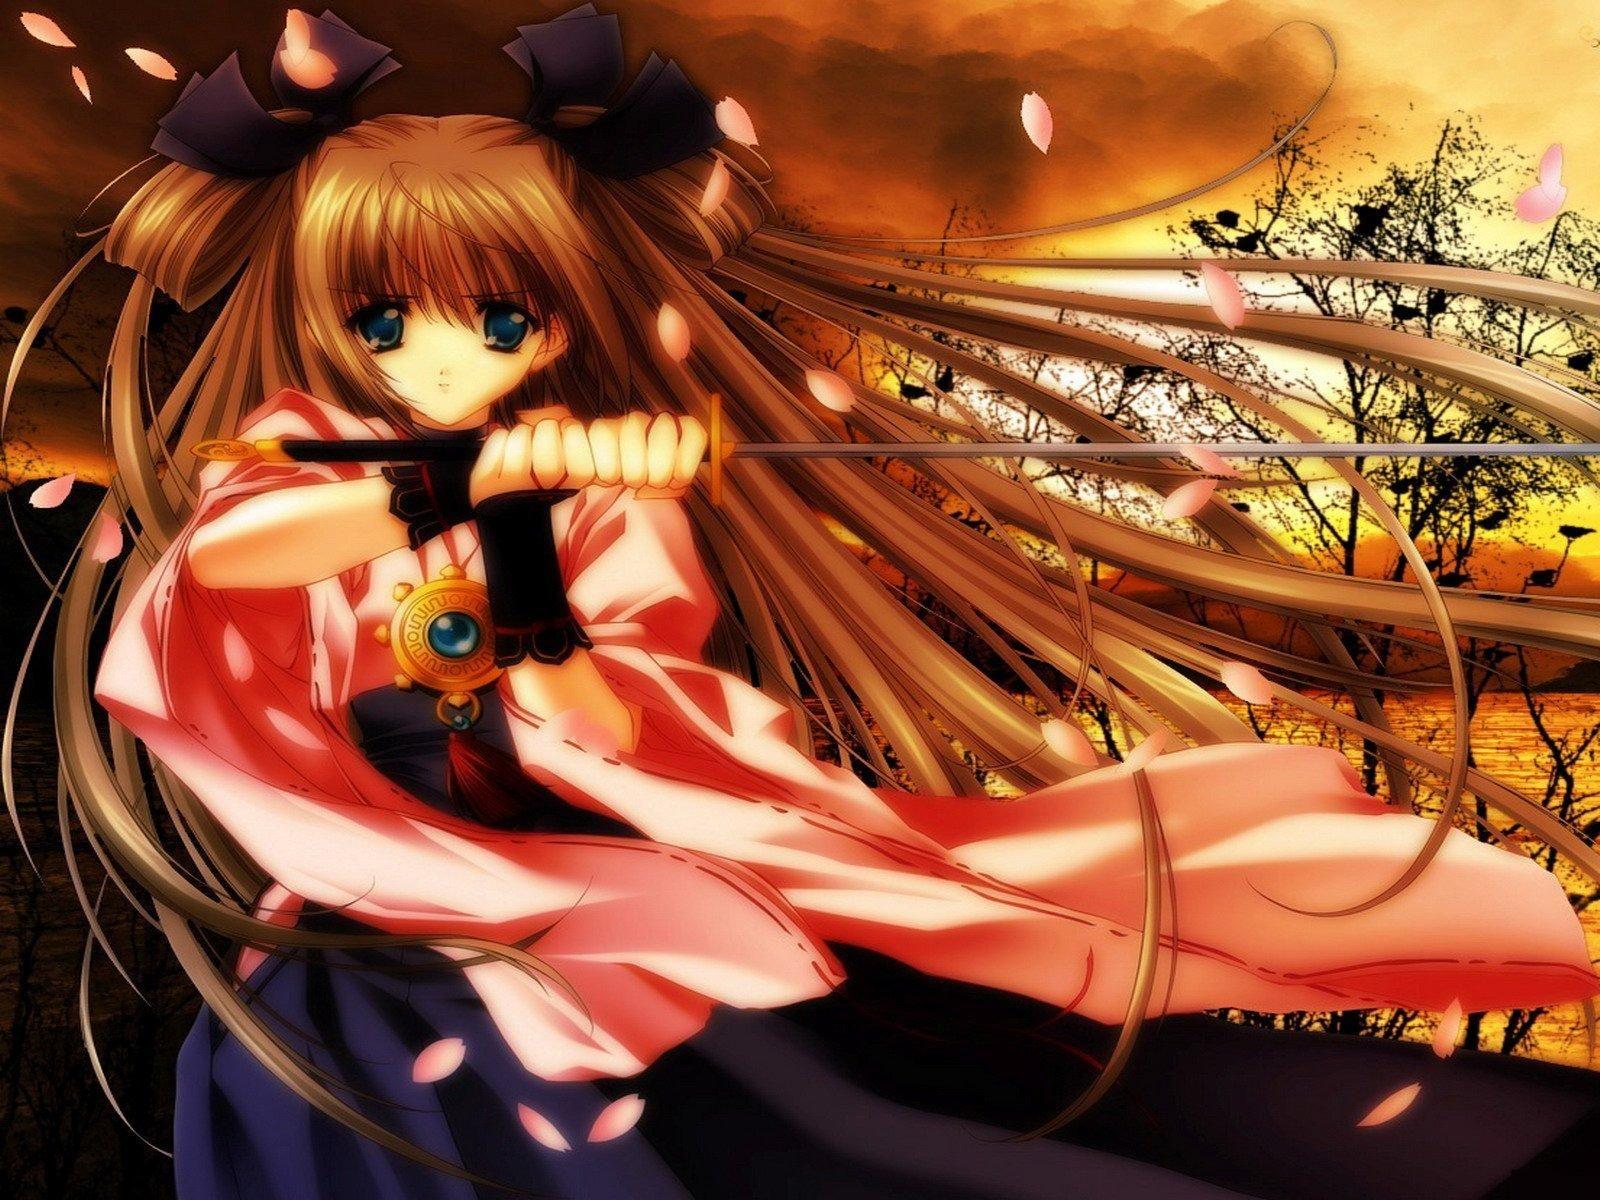 Anime Ninja Girl in Pink Anime wallpaper download, Anime